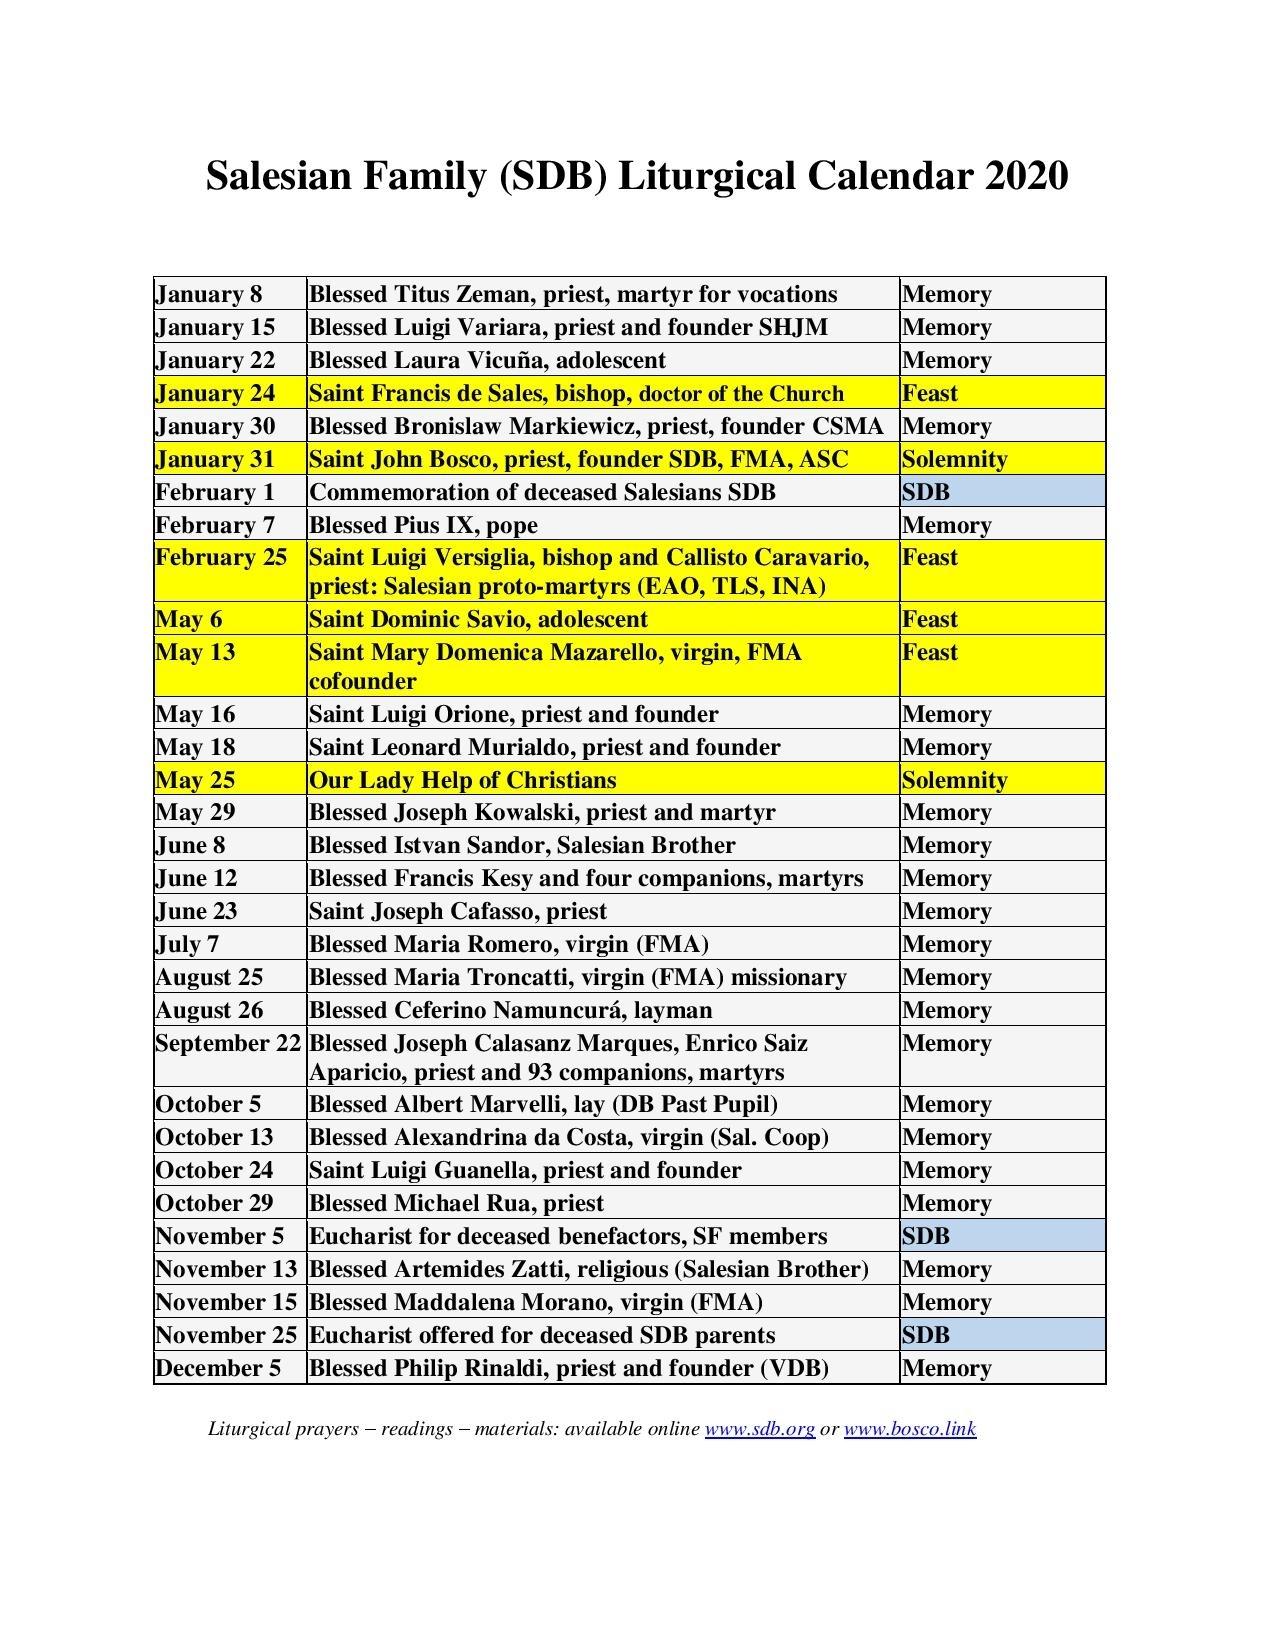 Resource - Salesian Liturgical Calendar 2020 intended for 2020 Catholic Liturgical Calendar Pdf